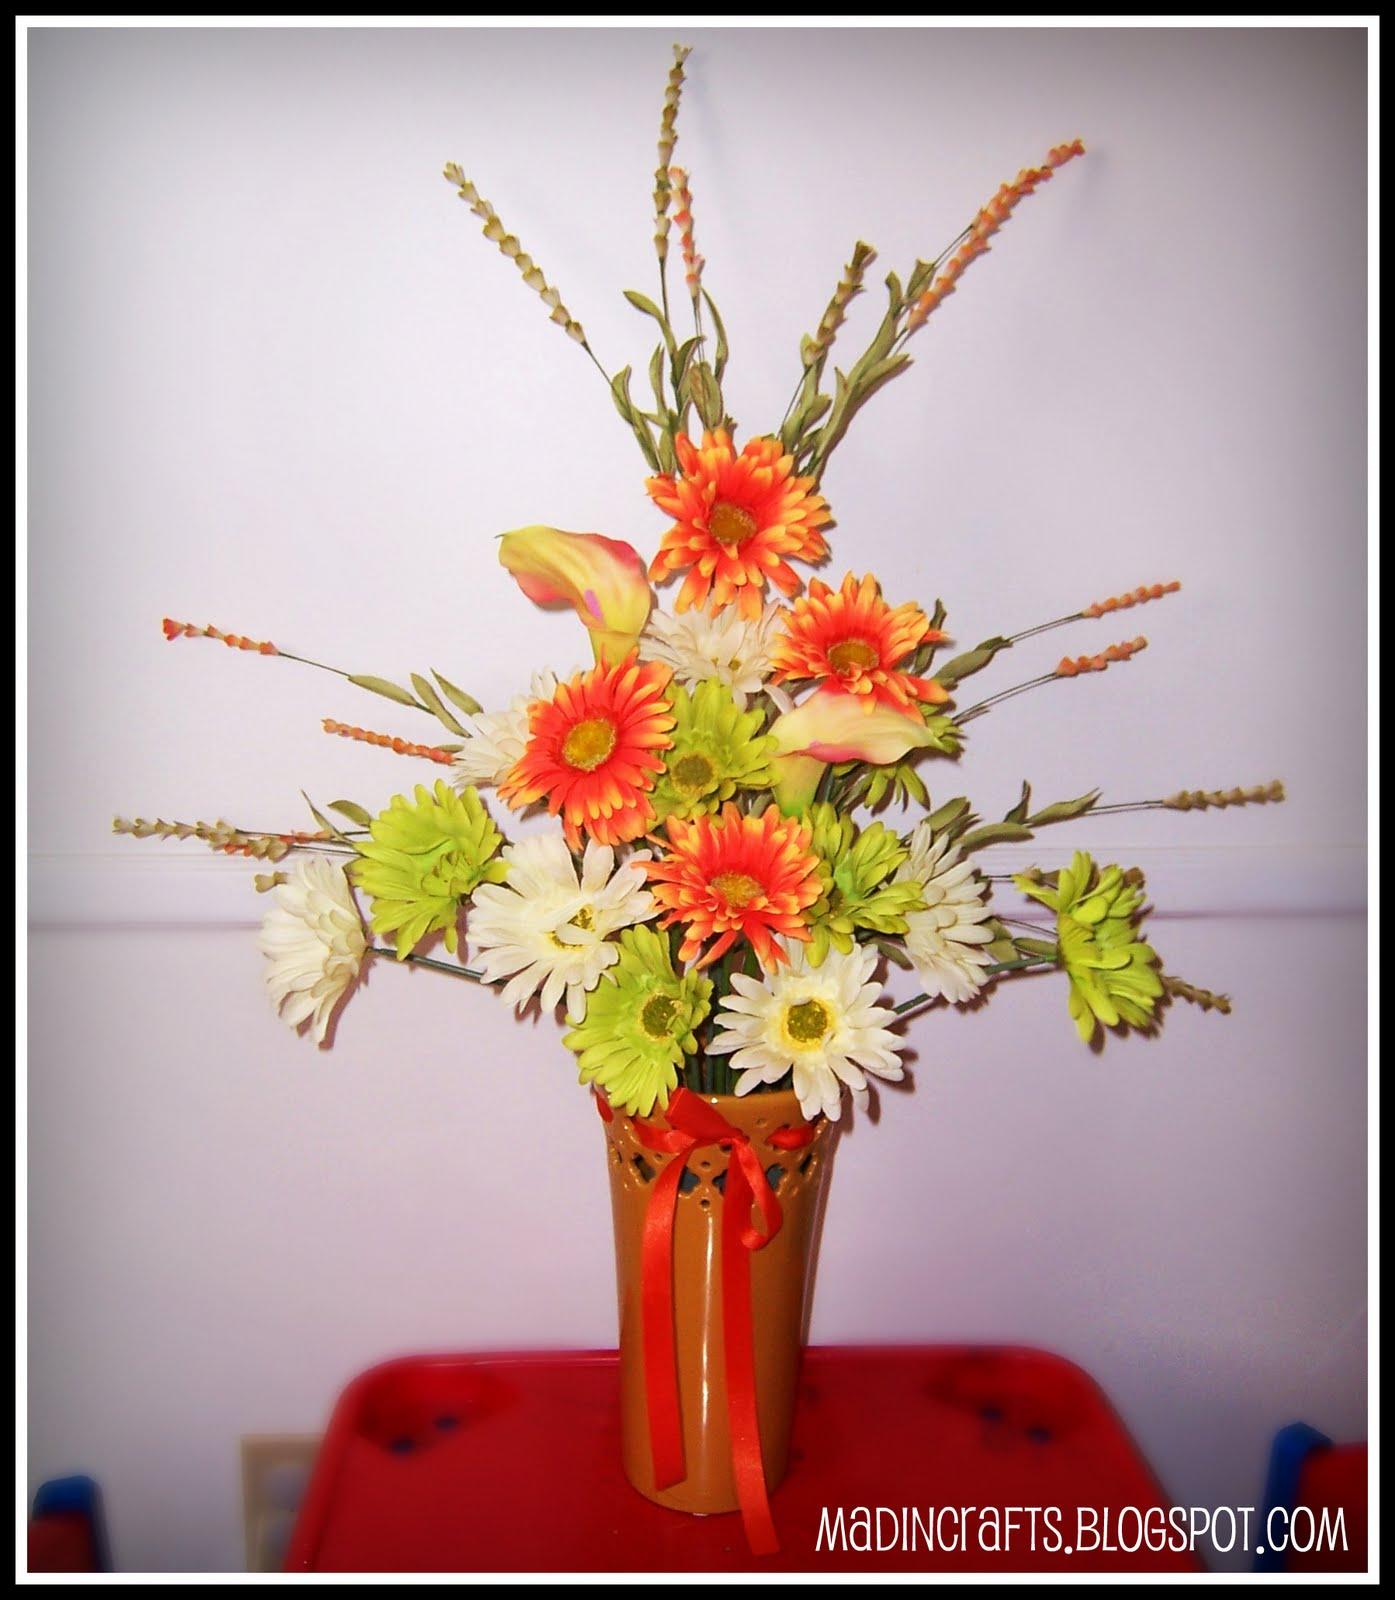 Creating Large Silk Flower Arrangements - Mad in Crafts